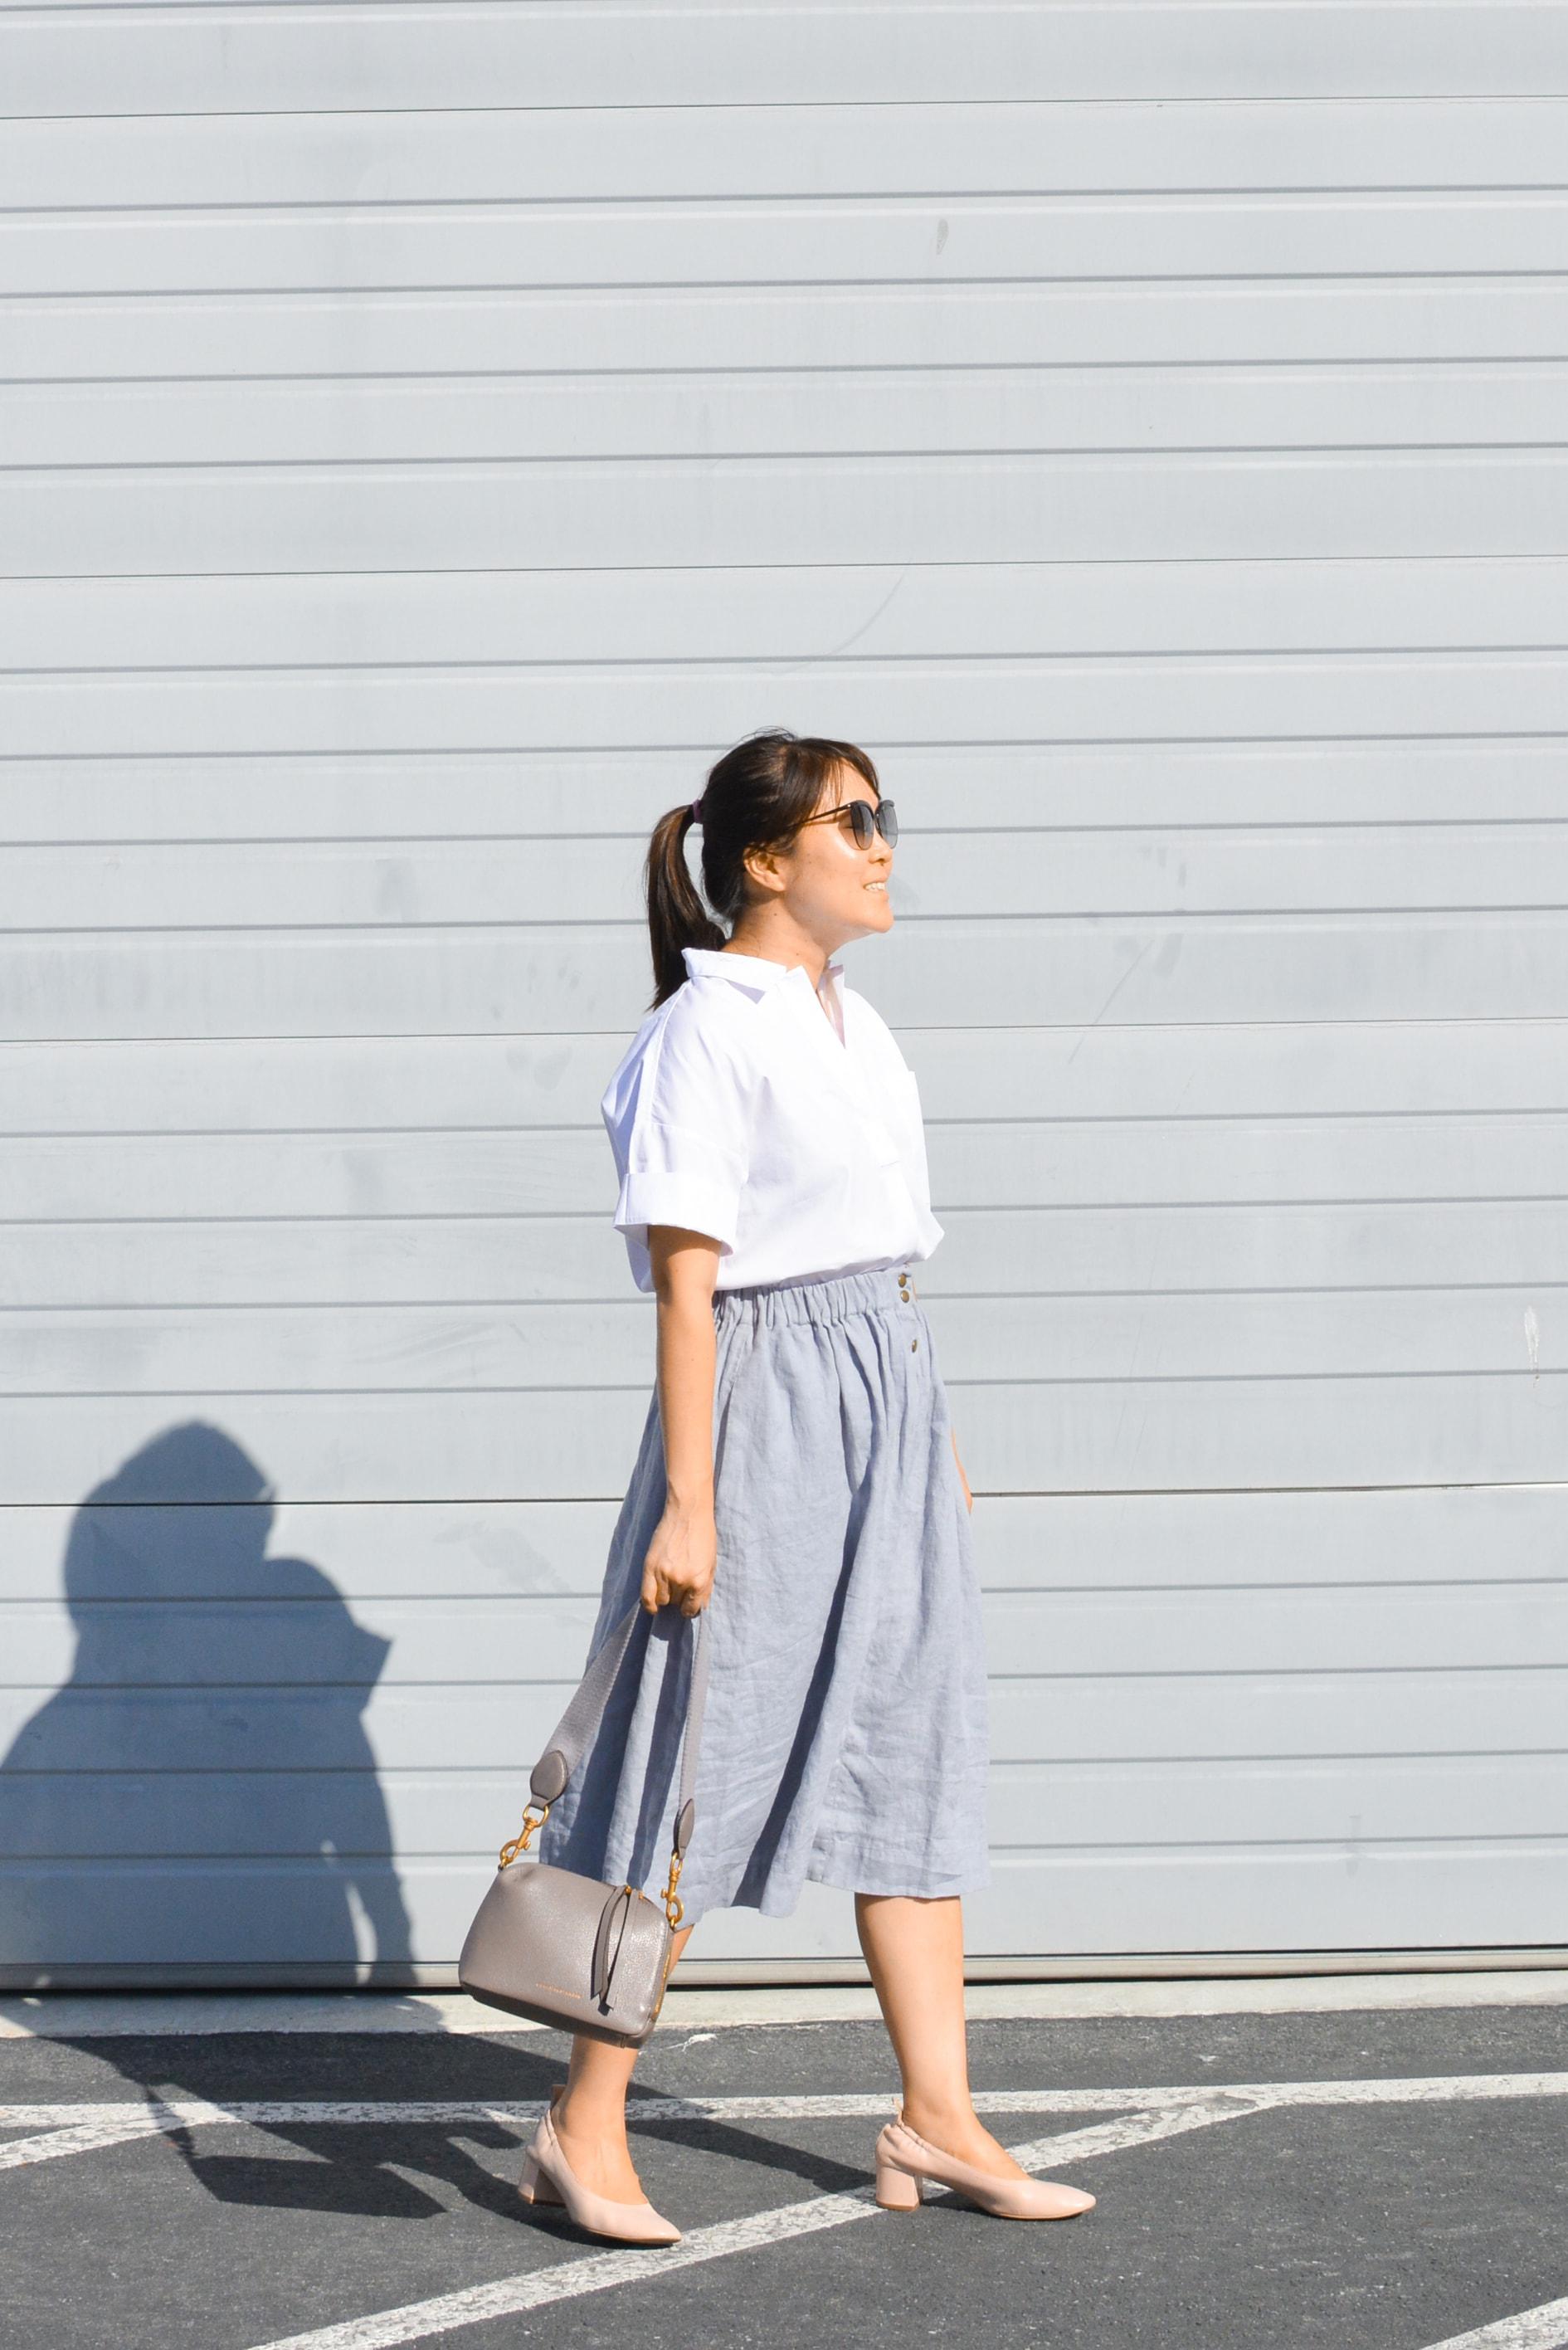 NotPerfectLinen Review Marseille Skirt (2 of 3)-min.jpg